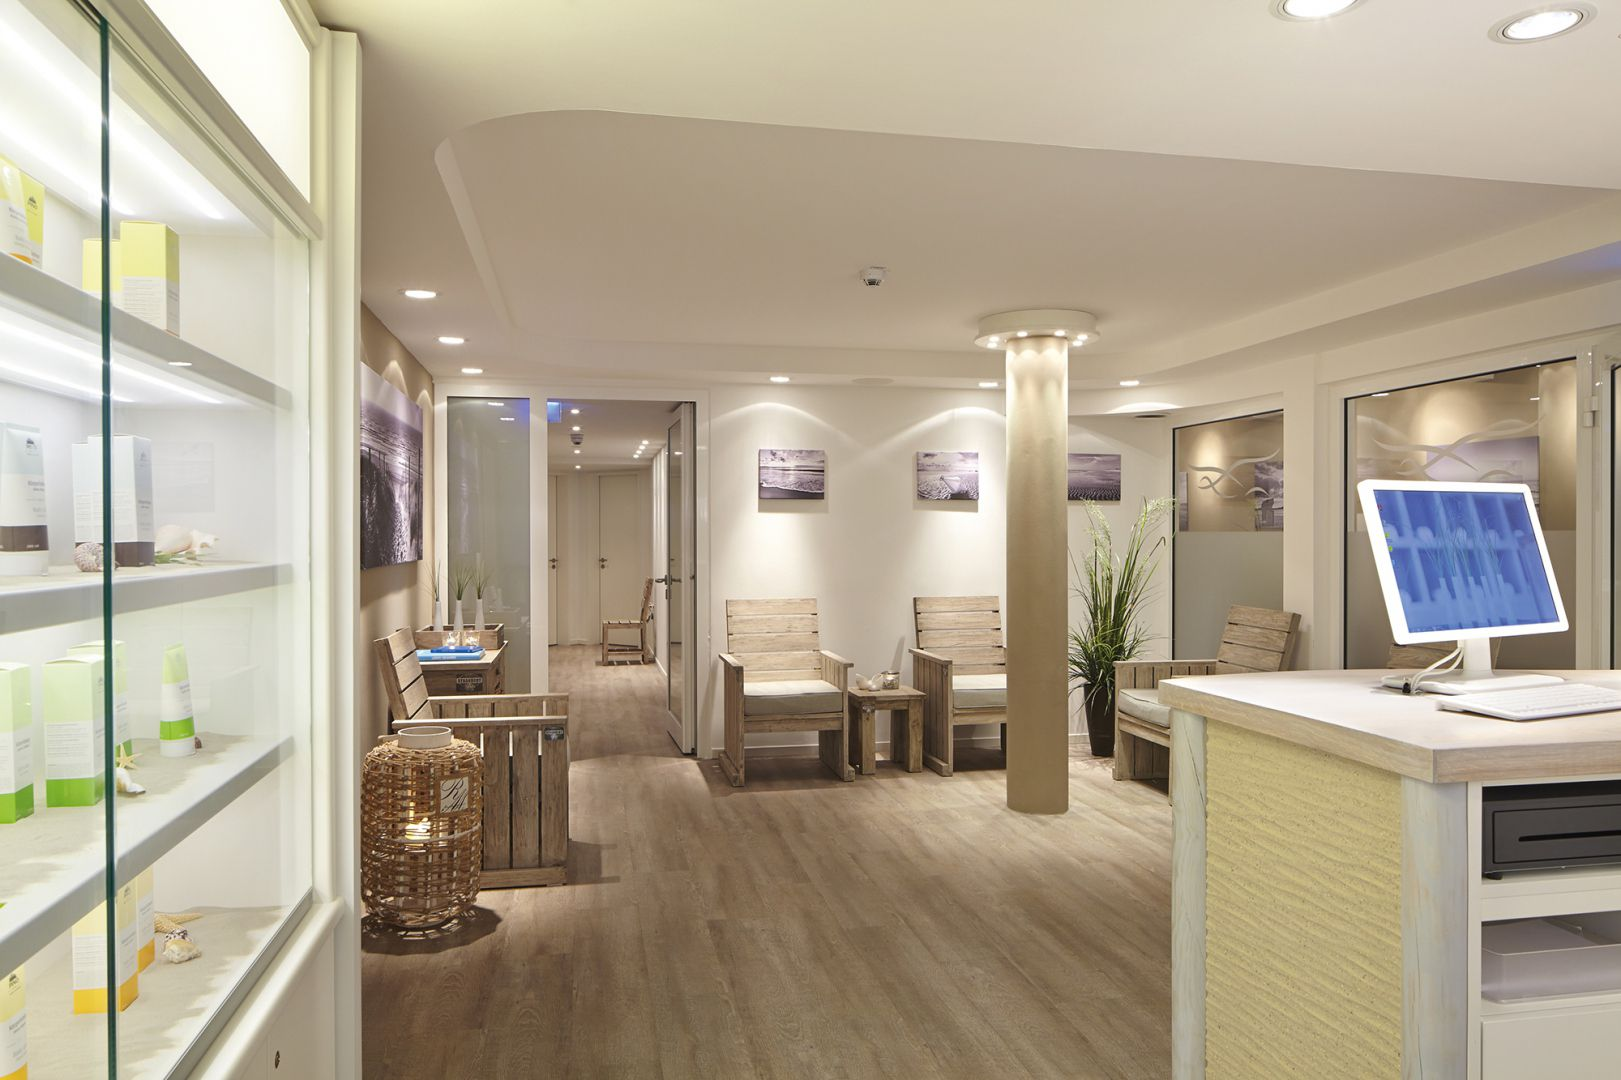 st peter ording hotel beach motel spo. Black Bedroom Furniture Sets. Home Design Ideas